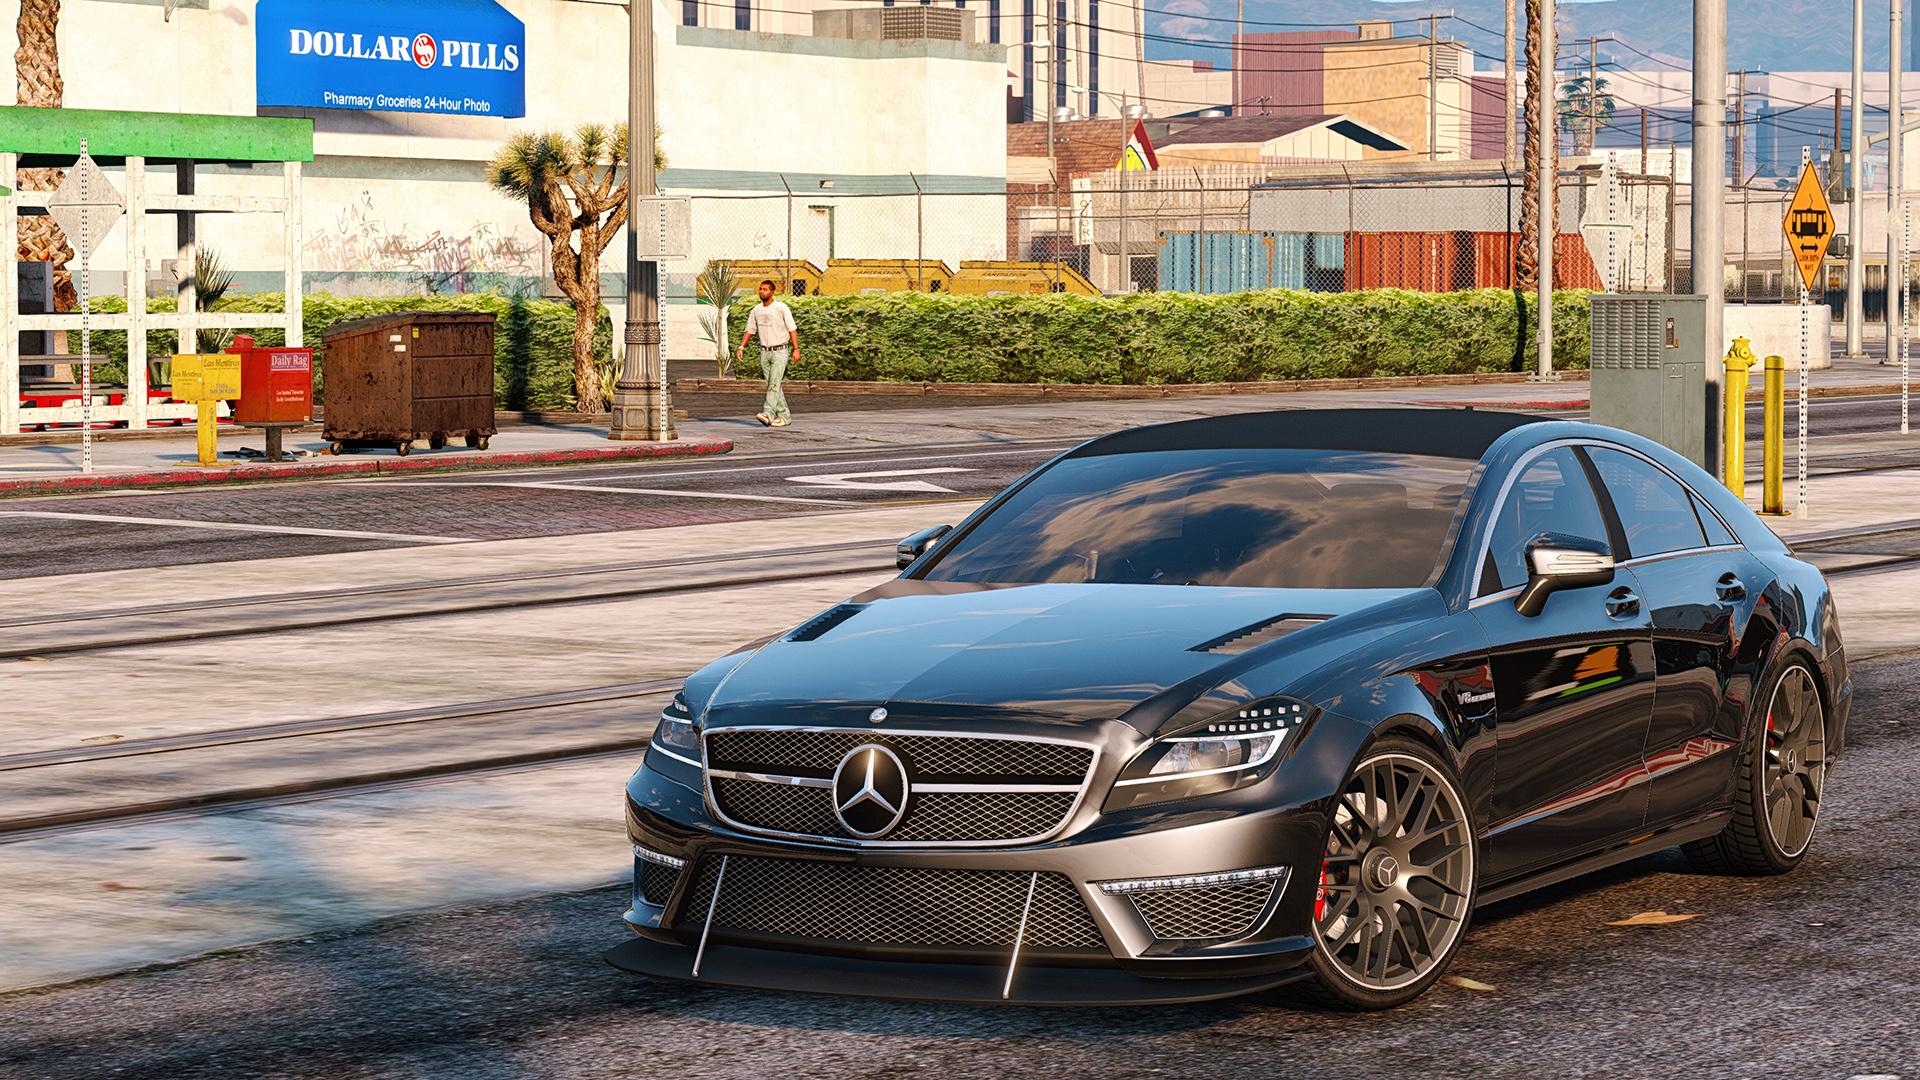 Mercedes Benz CLS 6 3 AMG [Add ] GTA5 Mods